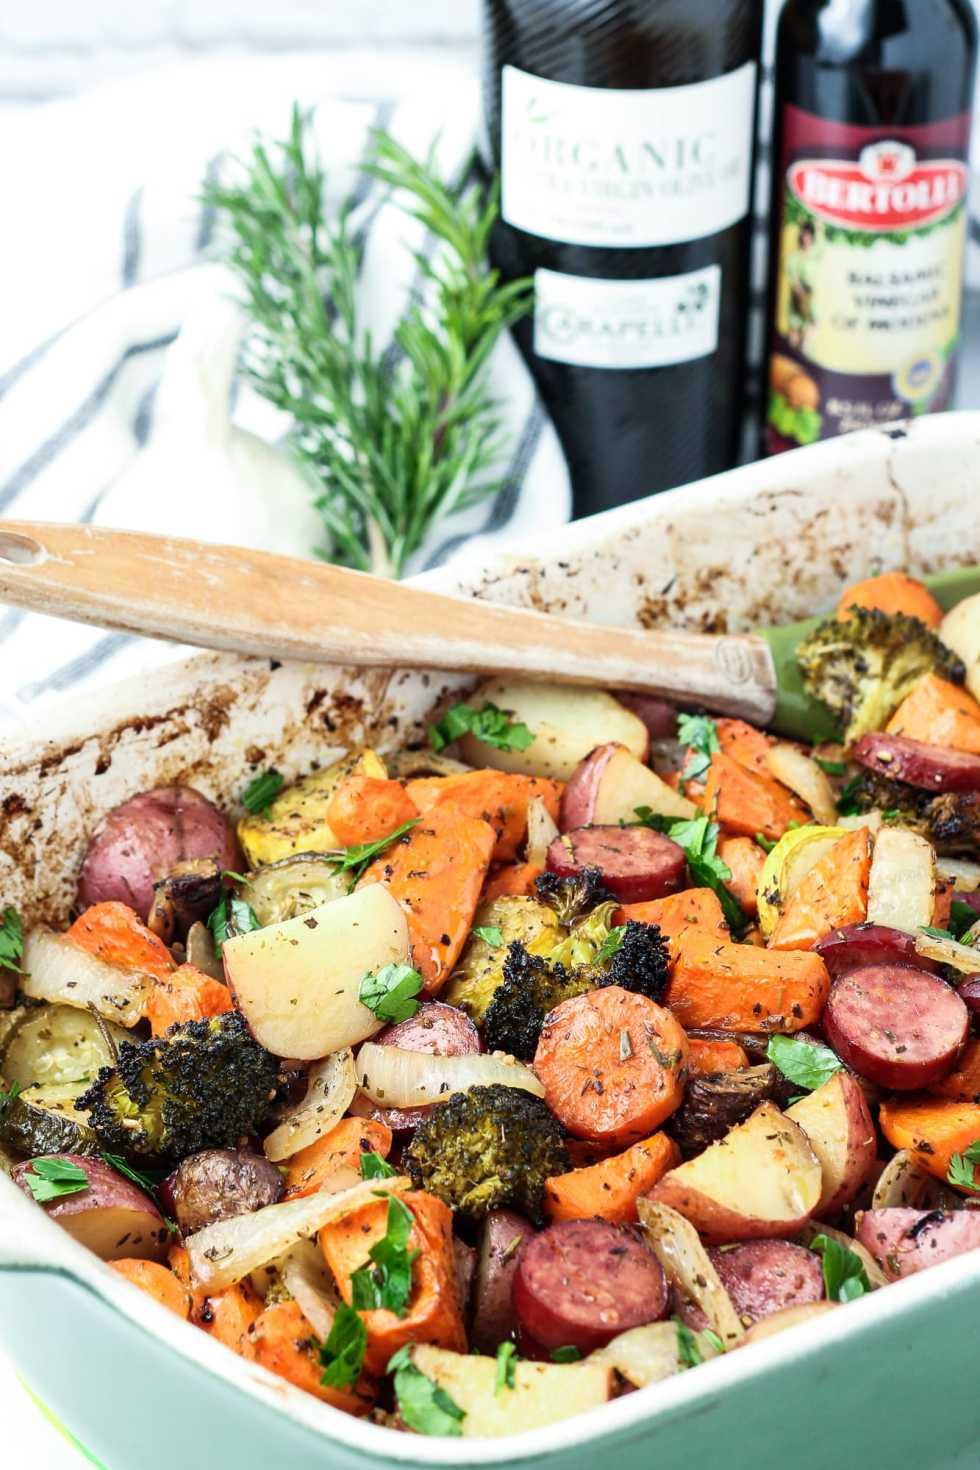 Roasted veggies in a baking dish